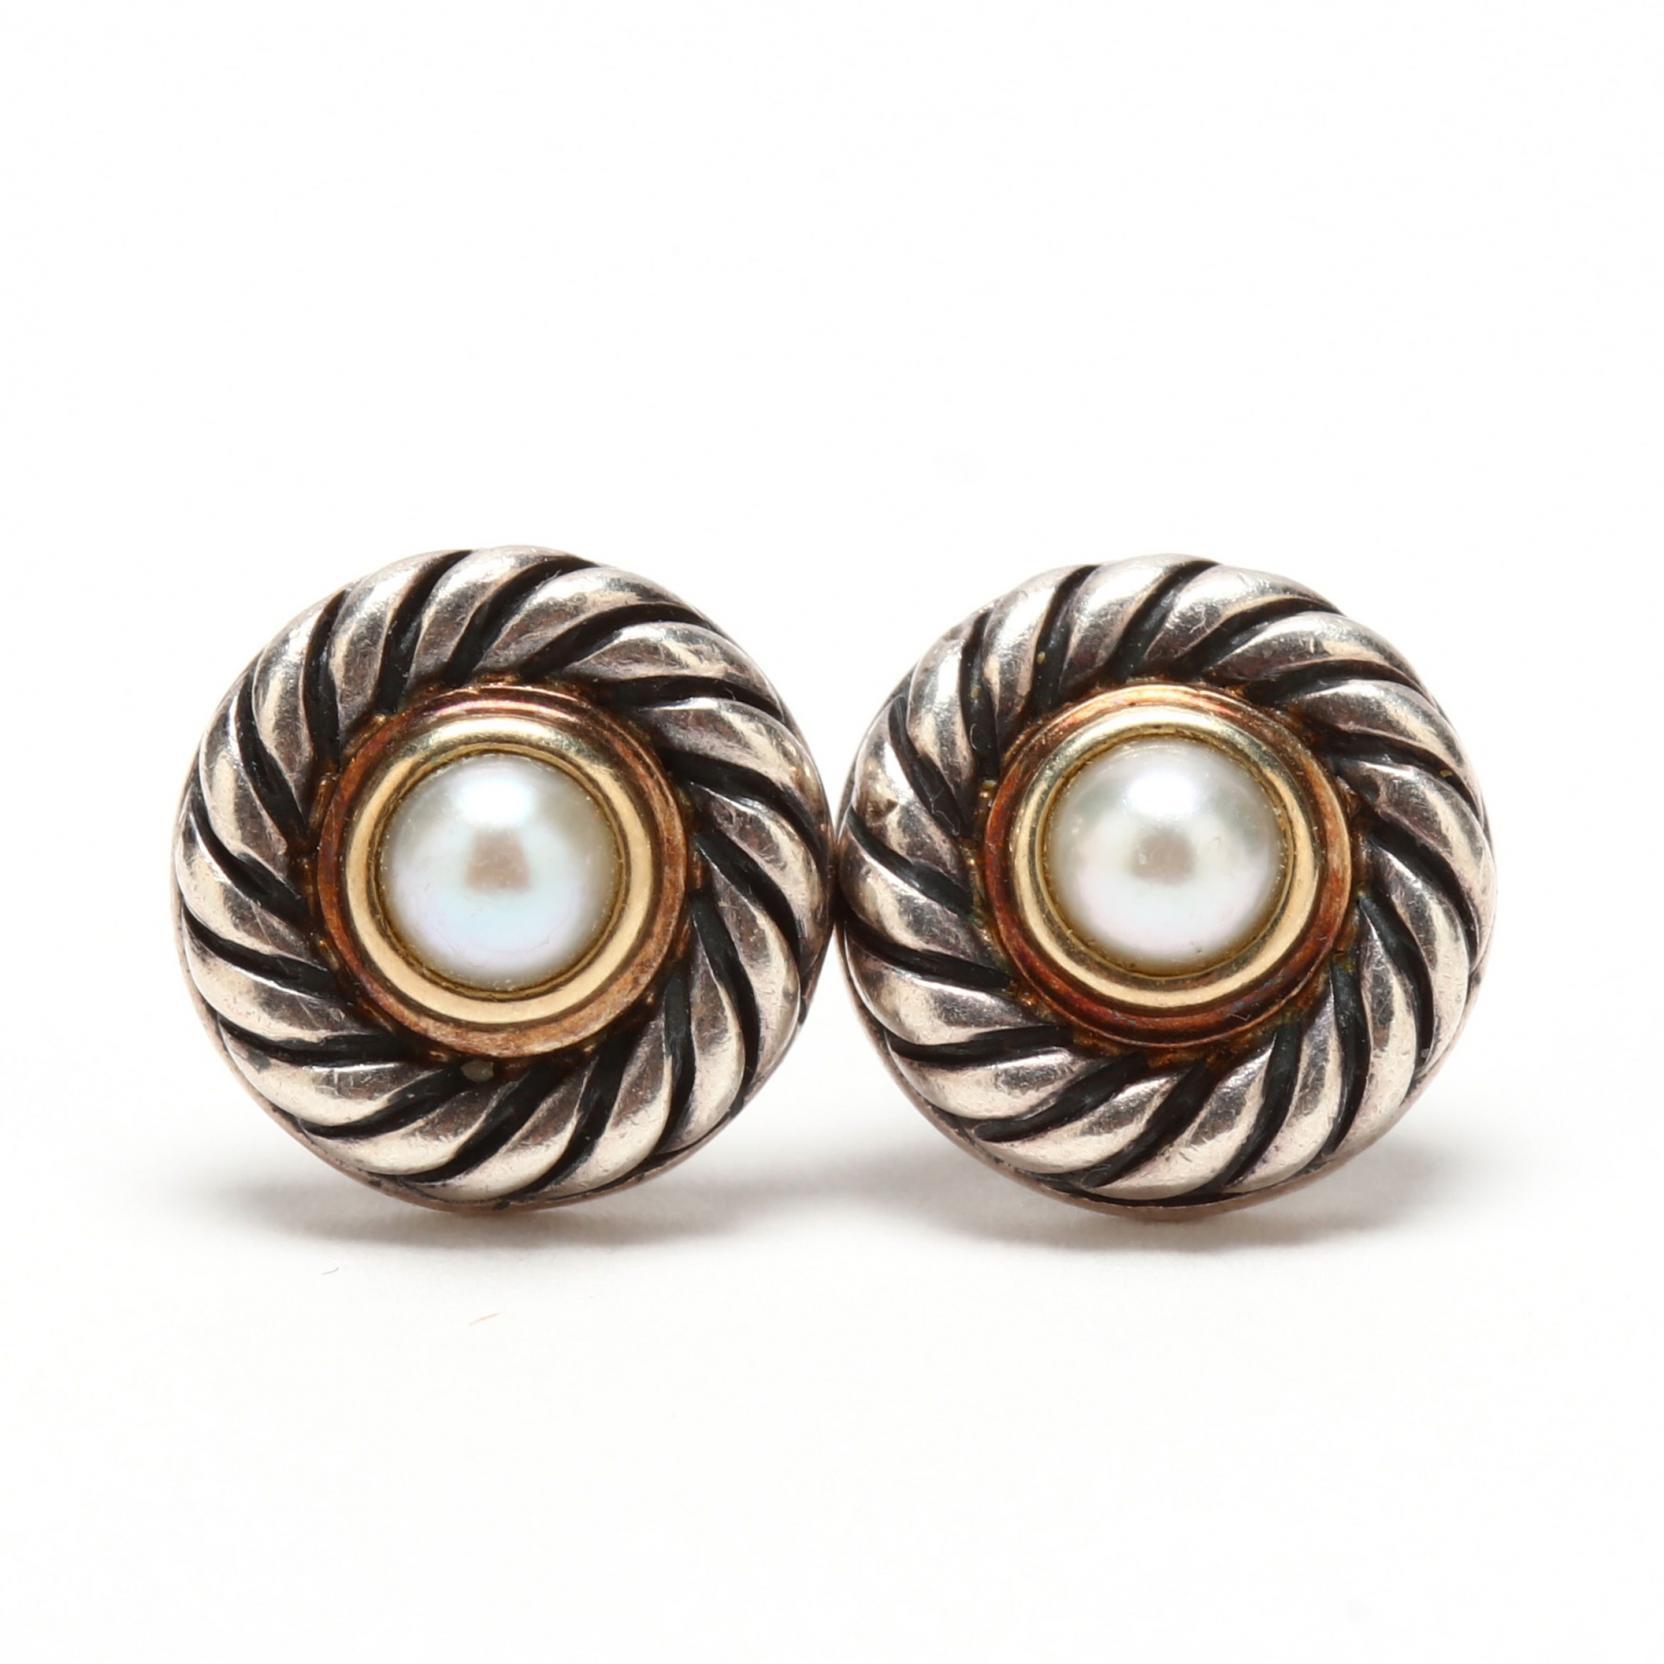 silver-14kt-gold-and-pearl-earrings-david-yurman